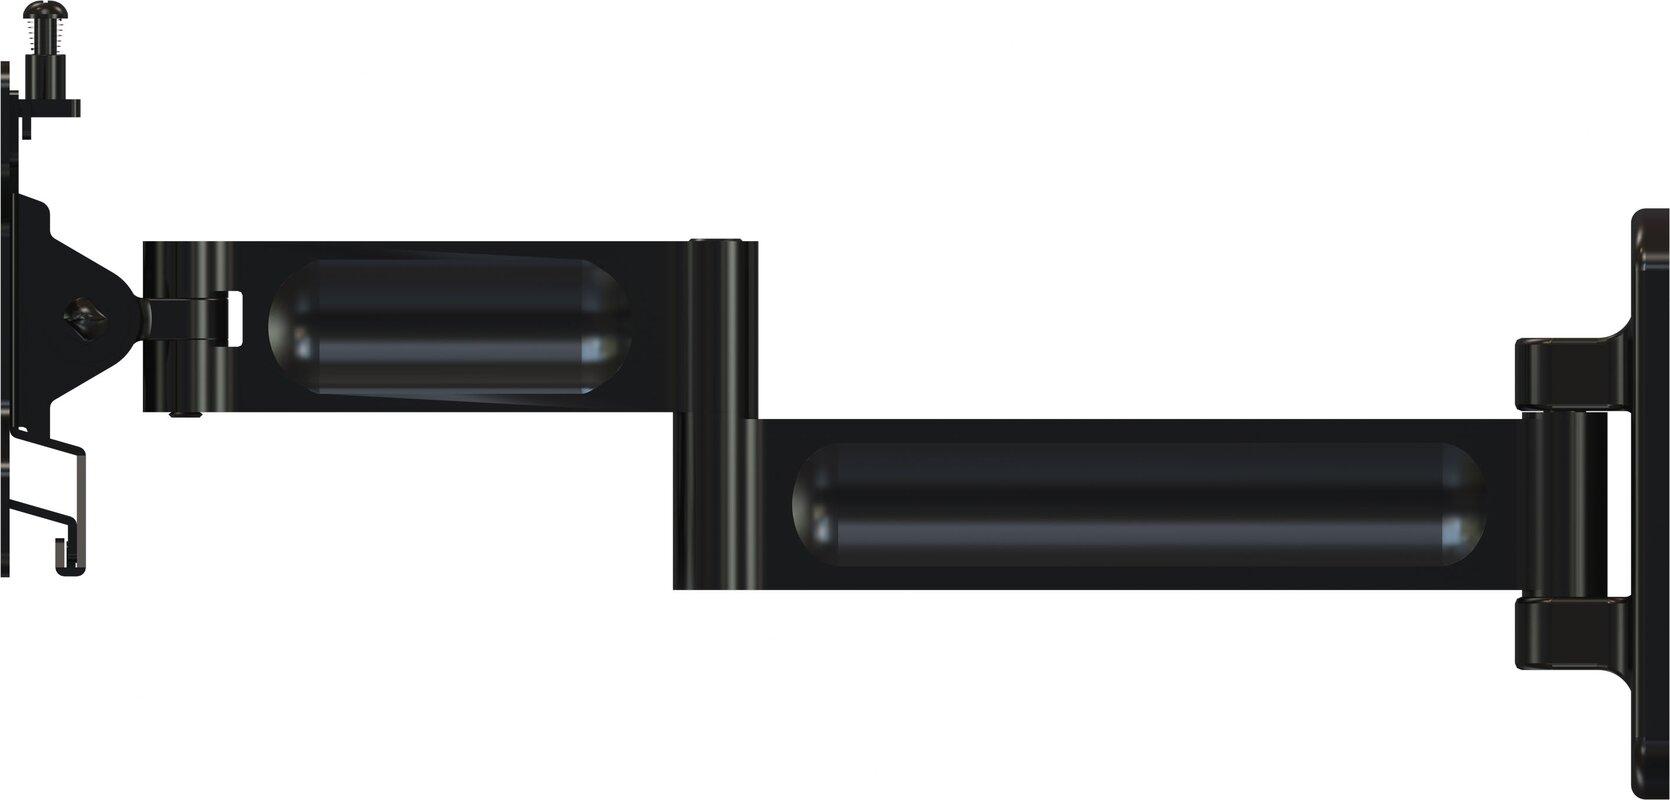 "Articulating Arm/Tilt Wall Mount for 13"" - 32"" Screens"